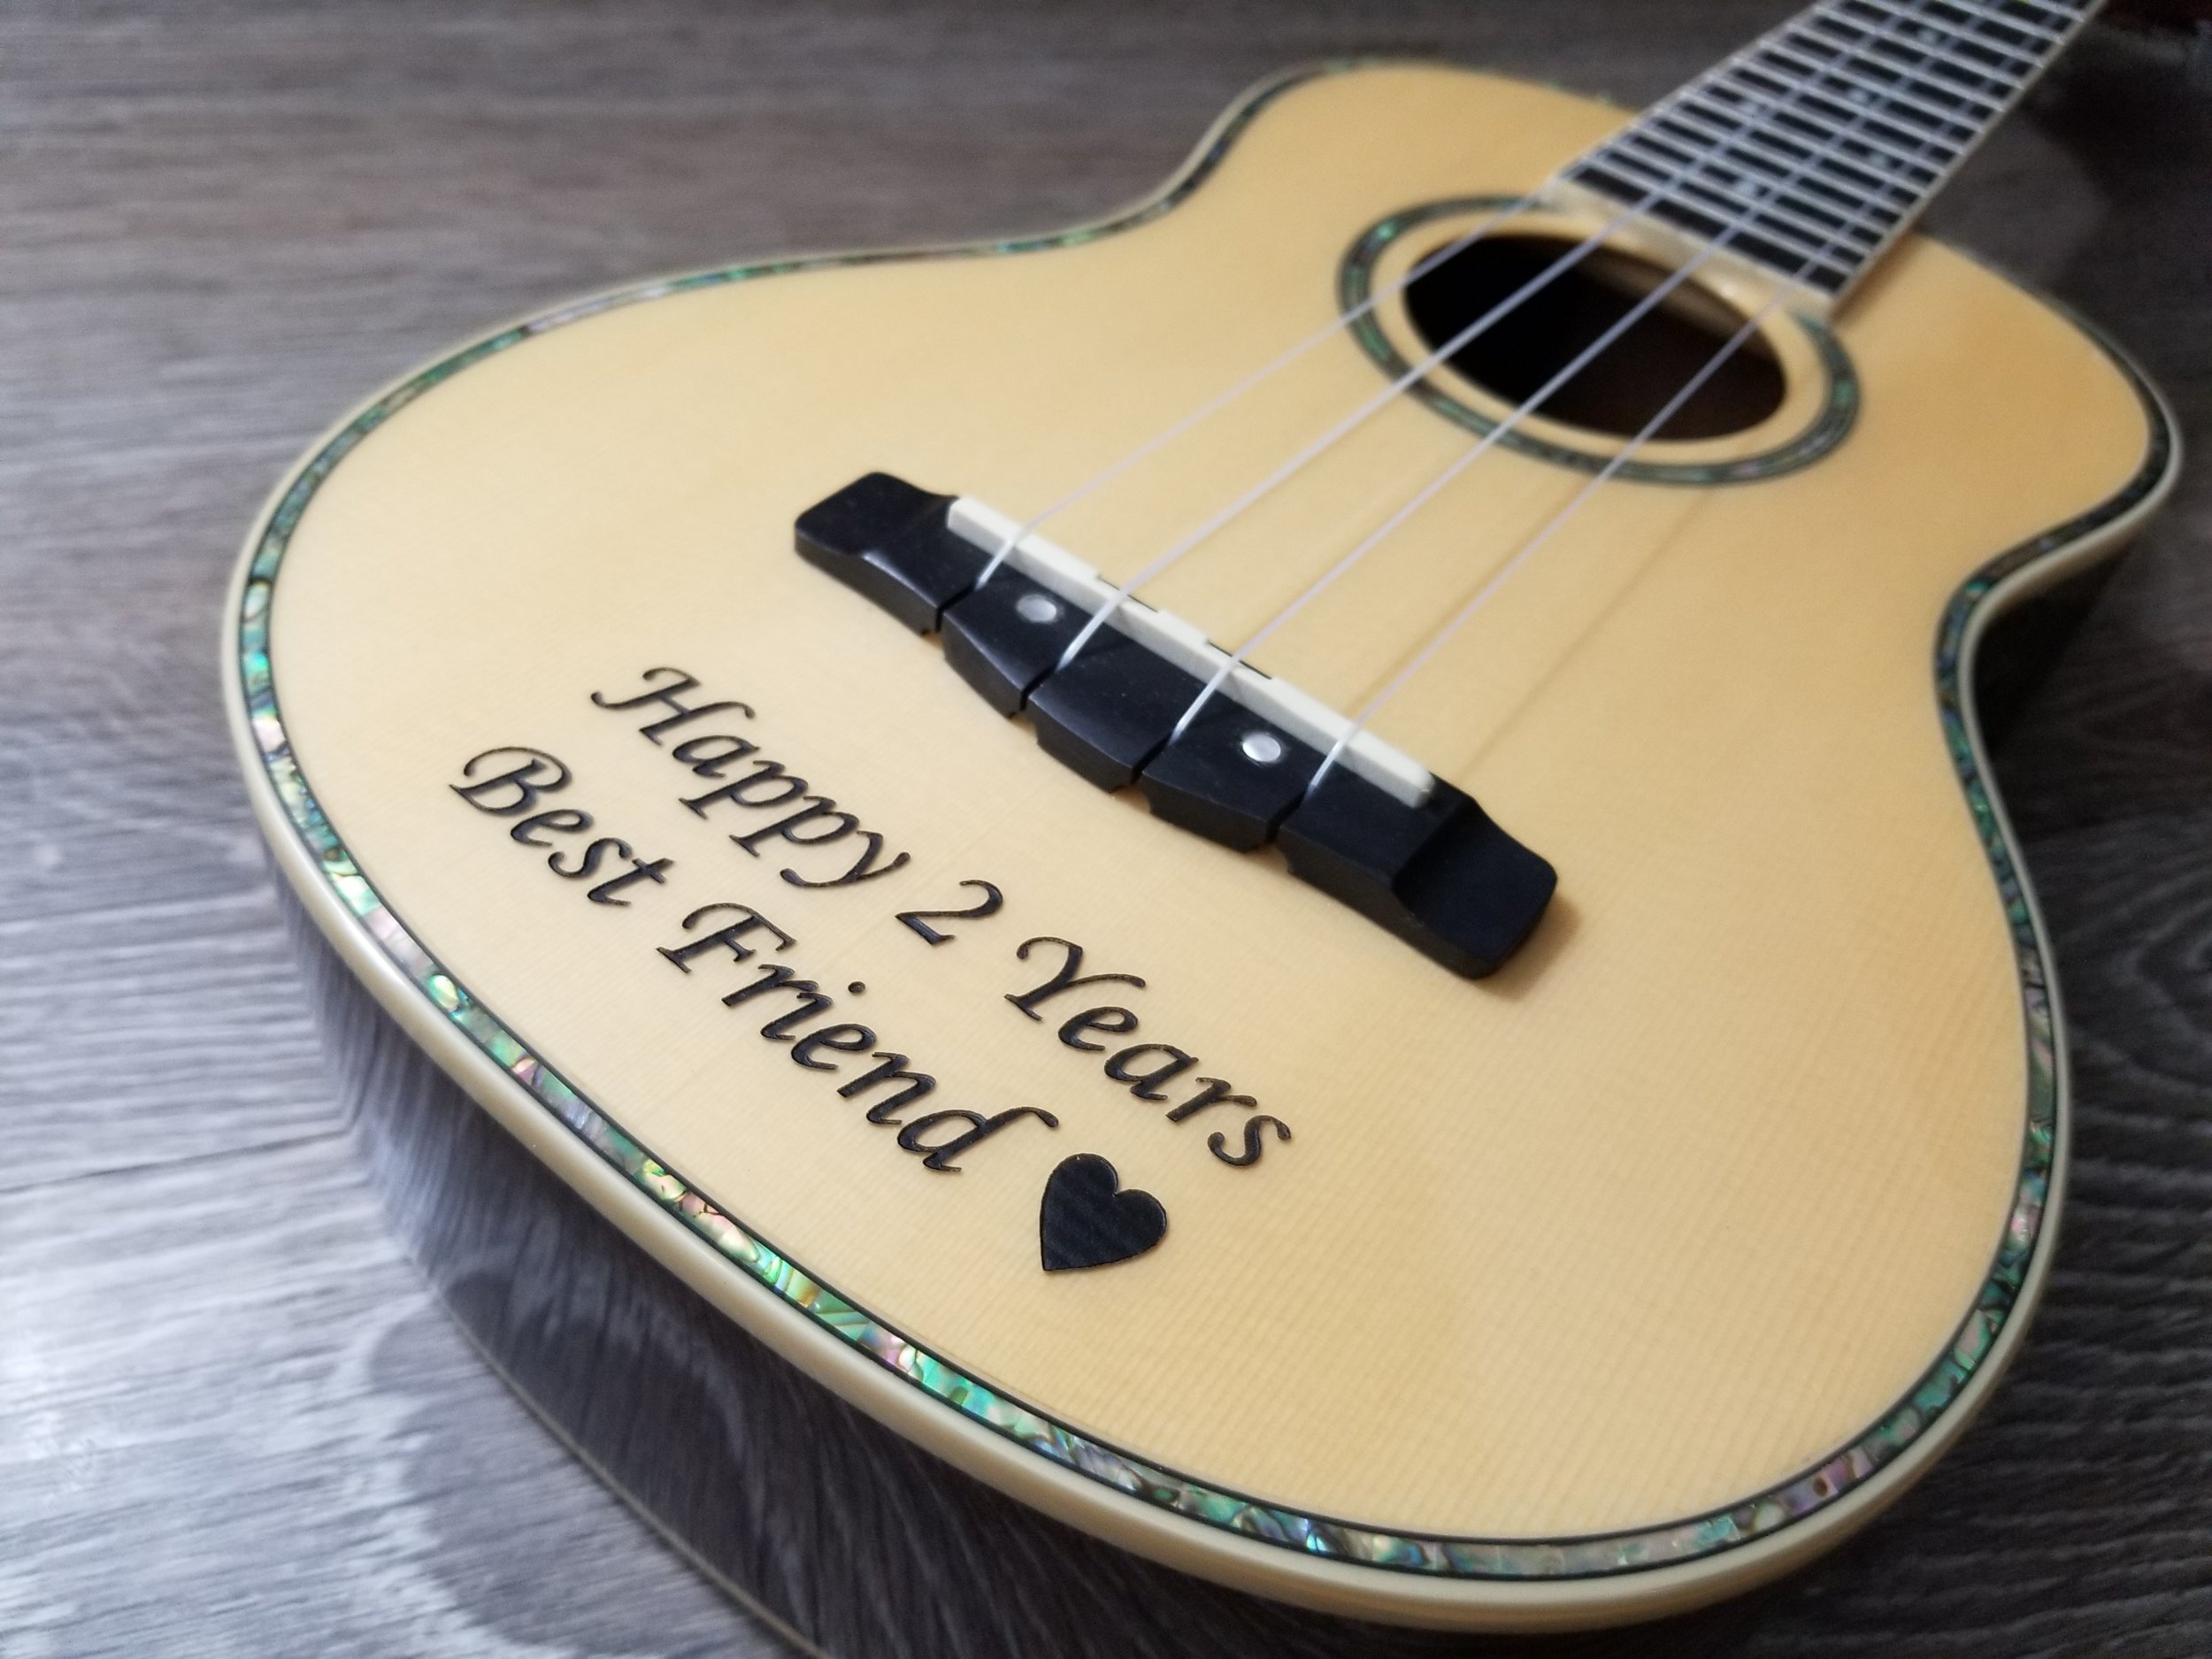 Copy of Custom Personalized Guitar - Personalized Instruments - Engraved Guitar - Engraved Instruments - Instrument Customization - Custom Projects from Engrave It Houston